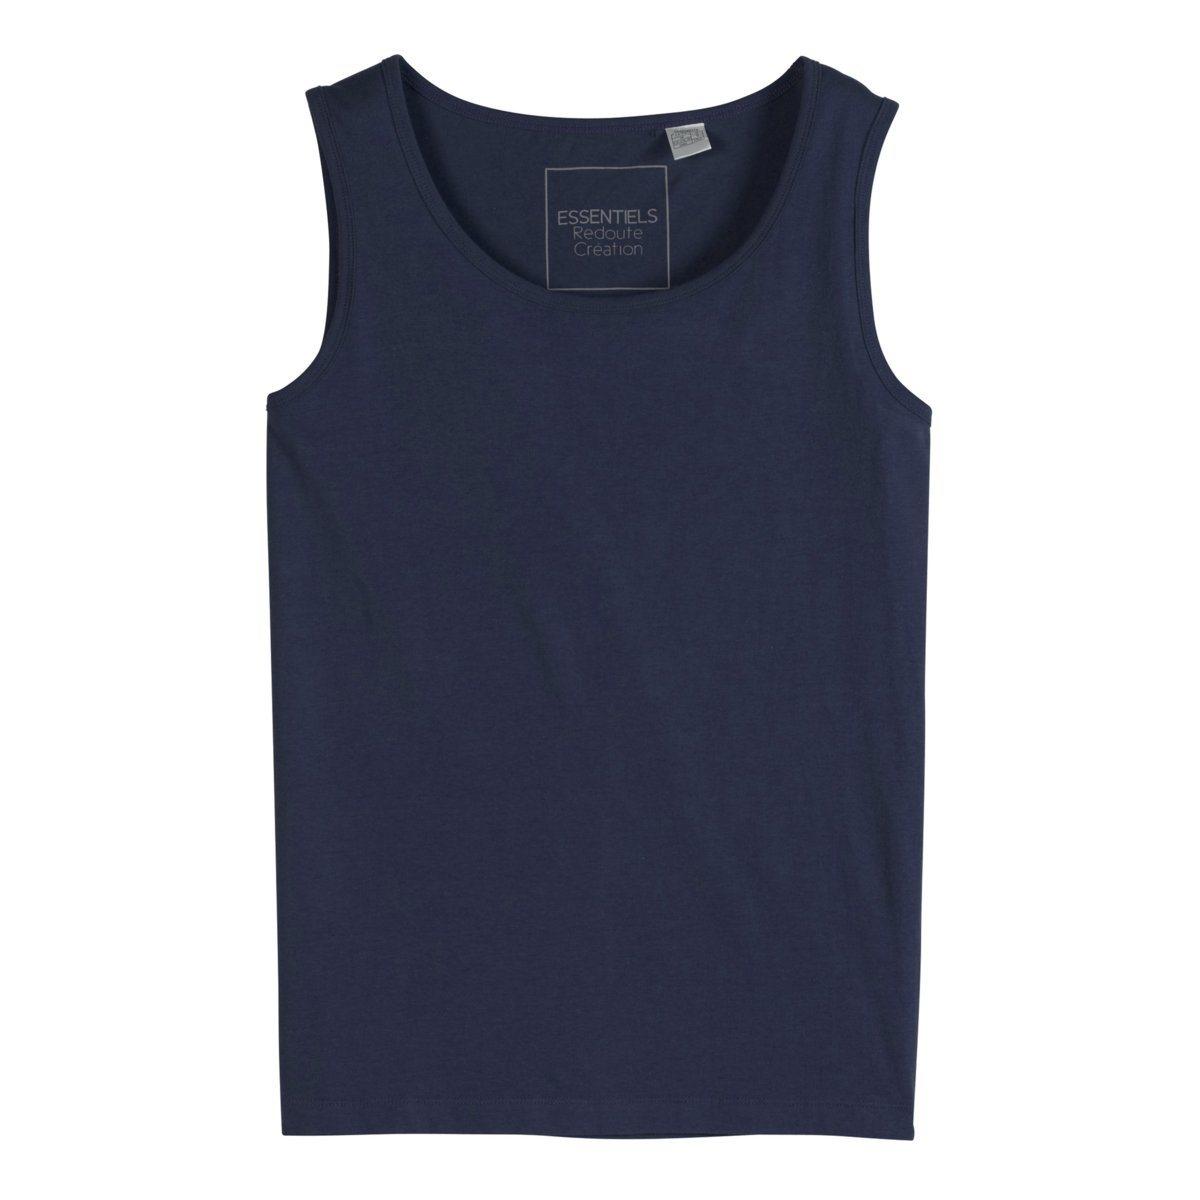 МайкаДжерси, 100% хлопка (цвет серый меланж: 85% хлопка, 15% вискозы). Длина 71 см.<br><br>Цвет: белый,серый меланж,темно-синий,черный<br>Размер: XL.XS.XS.L.3XL.S.4XL.M.M